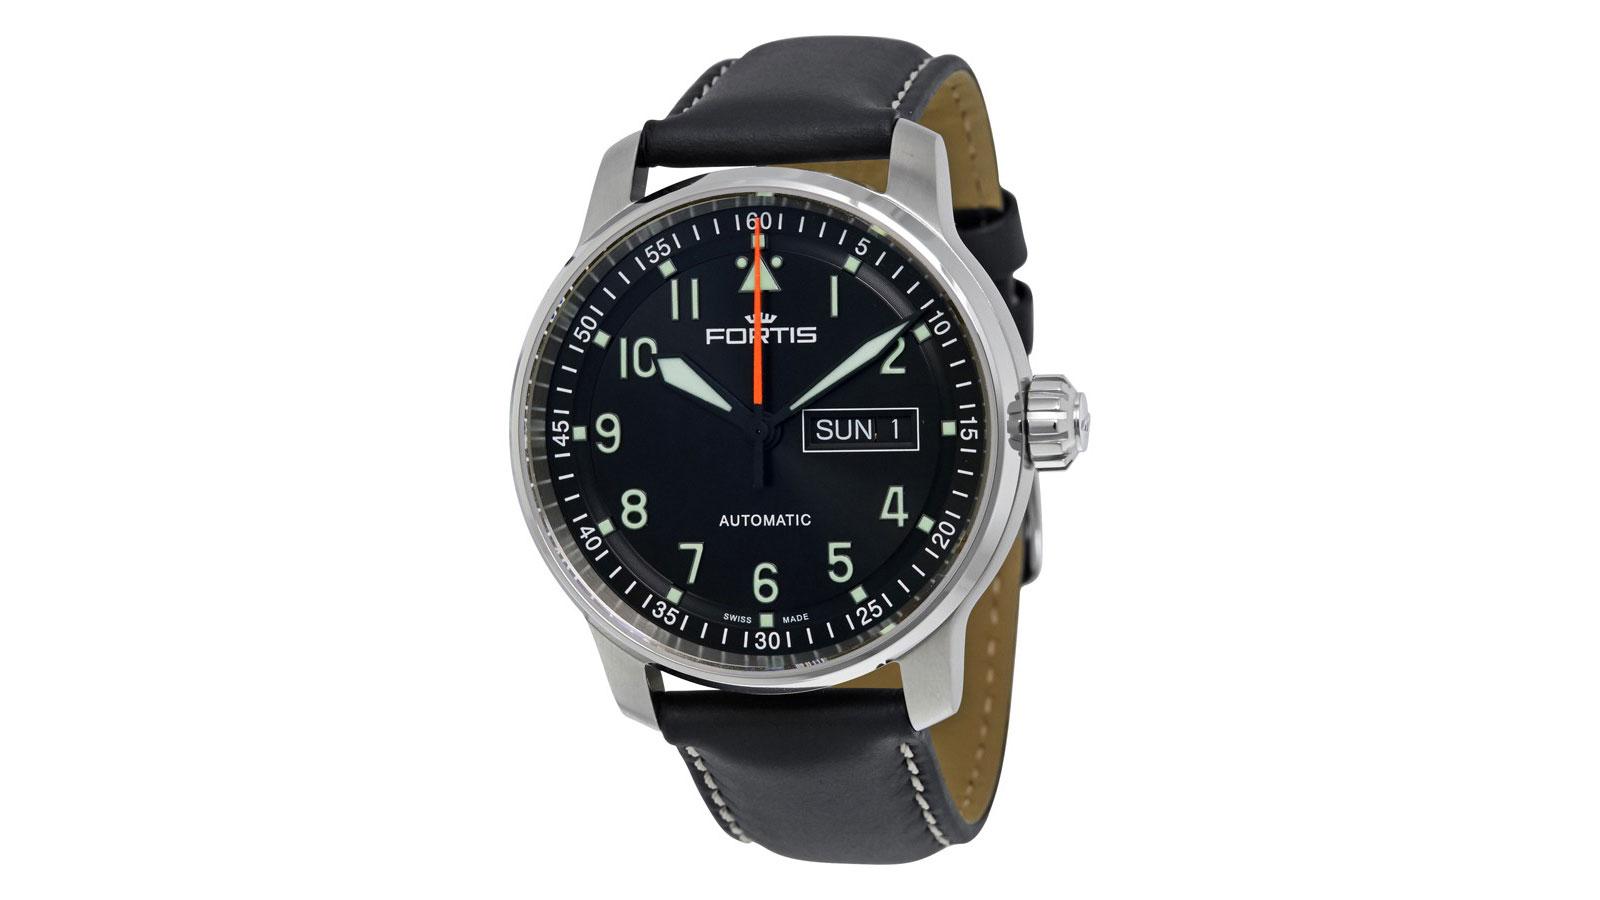 Fortis Pilot Watch | the best pilot watches for men